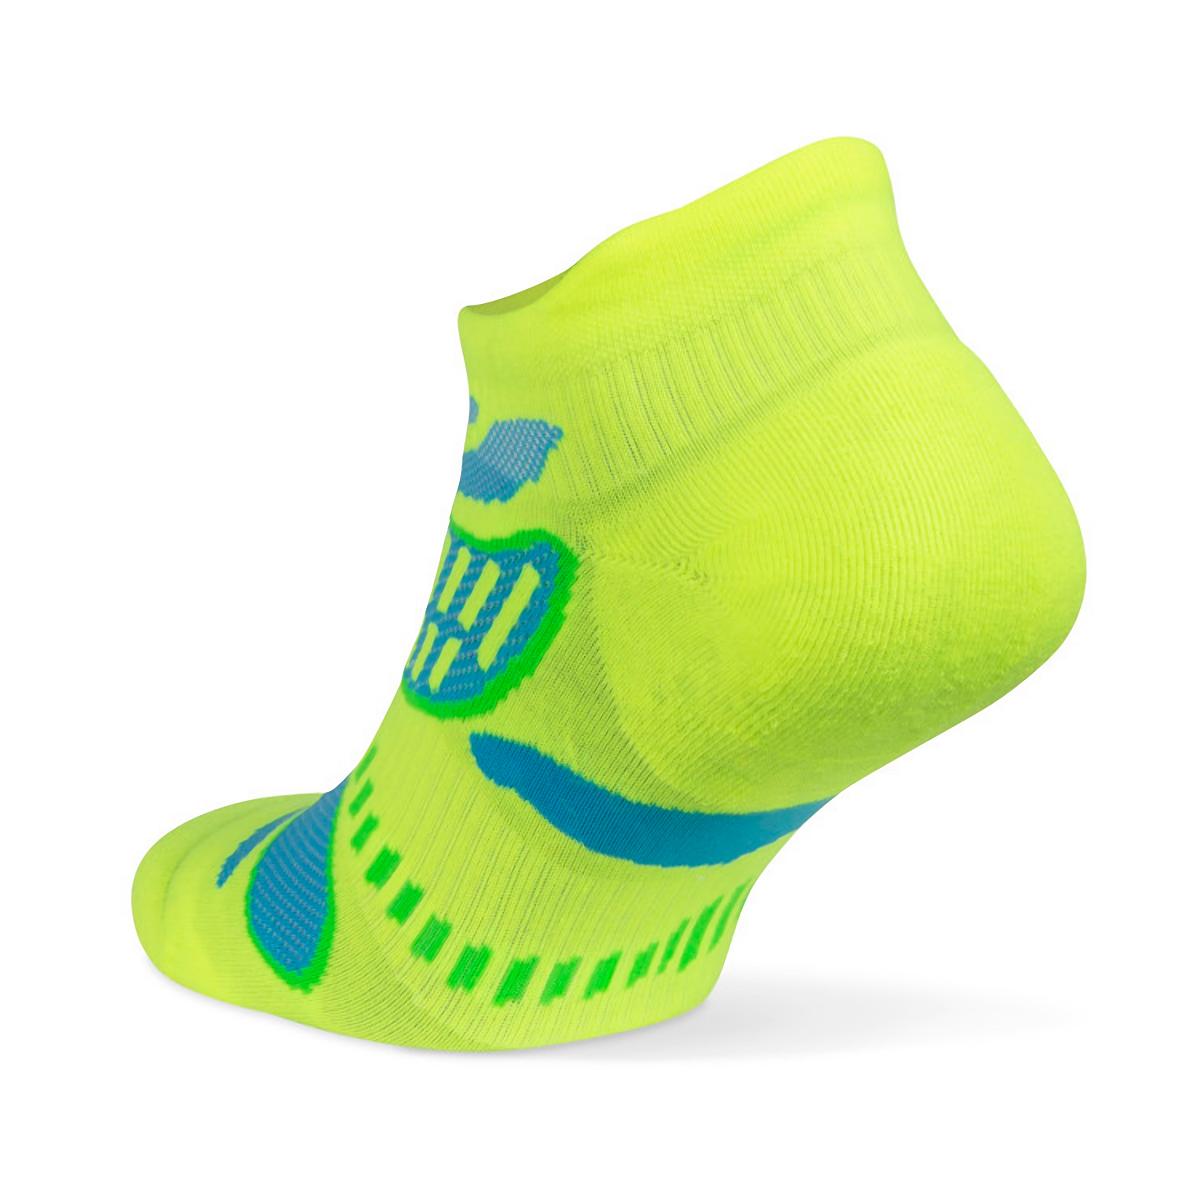 Balega Ultra Light No Show Tab Socks - Color: Neon Lime - Size: S, Neon Lime, large, image 2